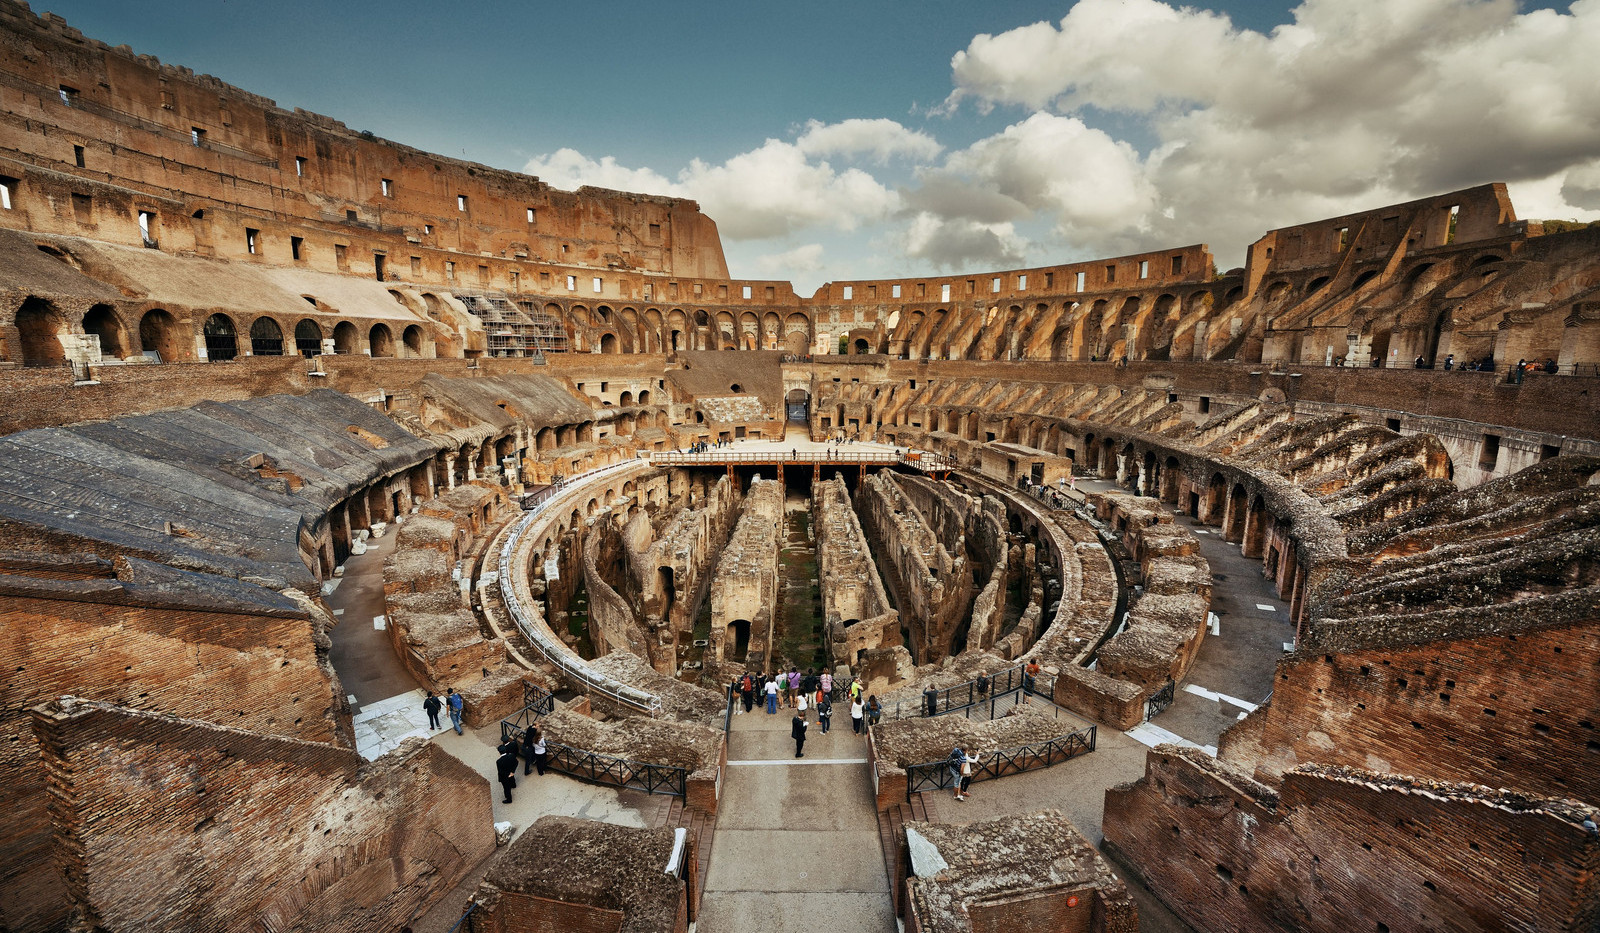 Canva - Colosseum in Rome.jpg